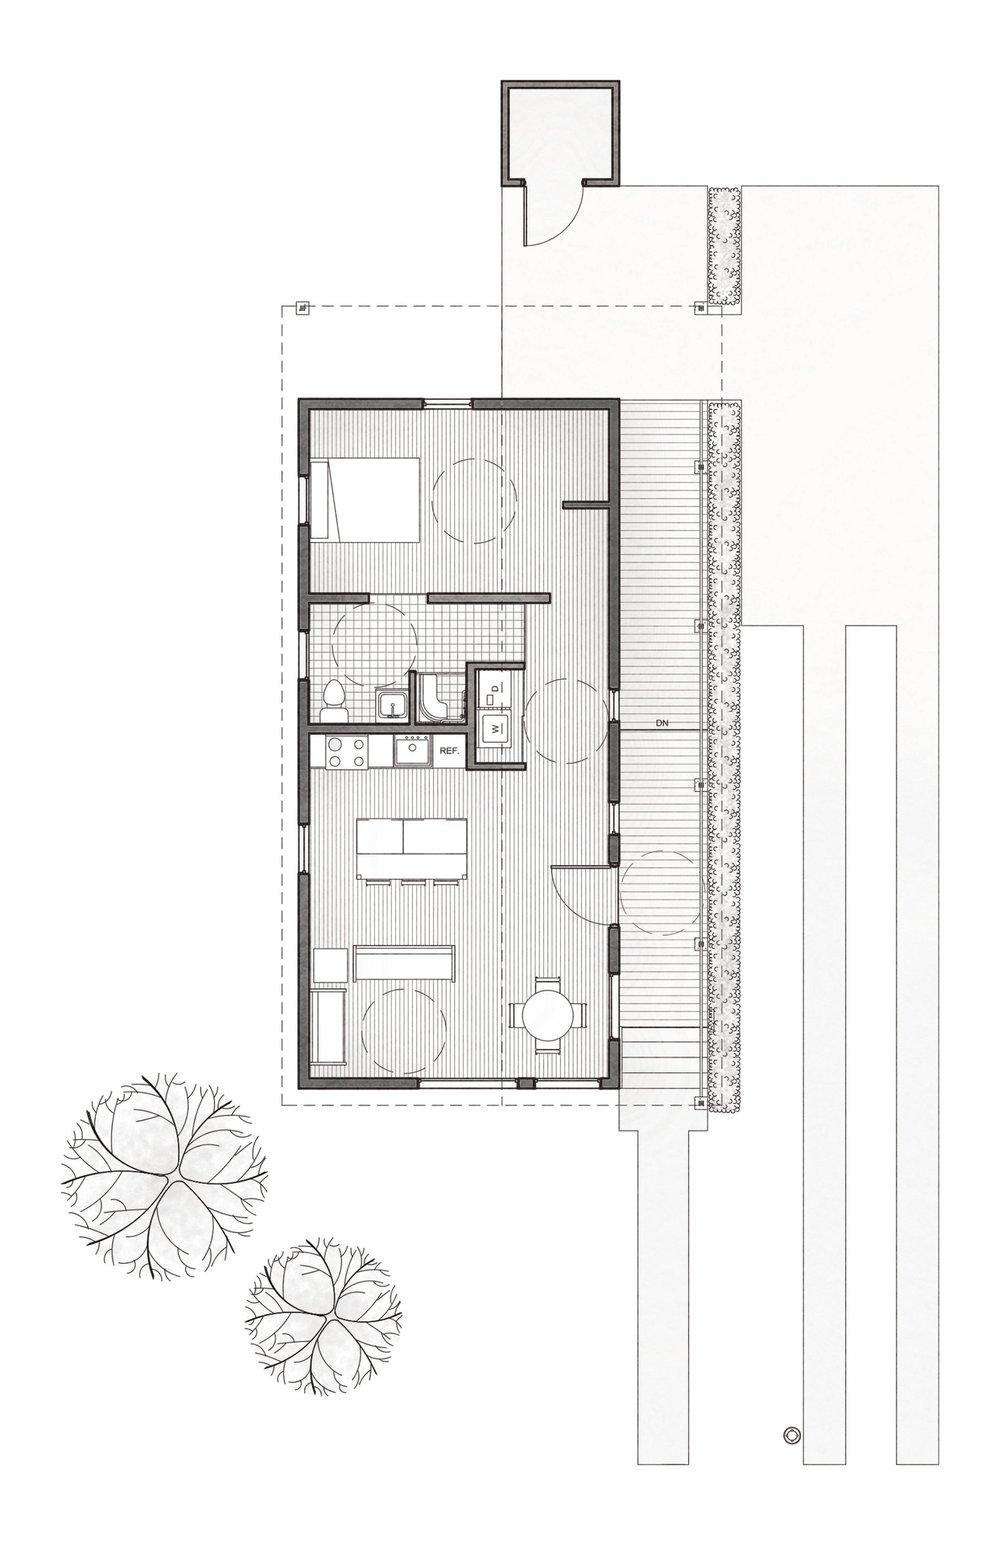 11X17 Prints-9.jpg